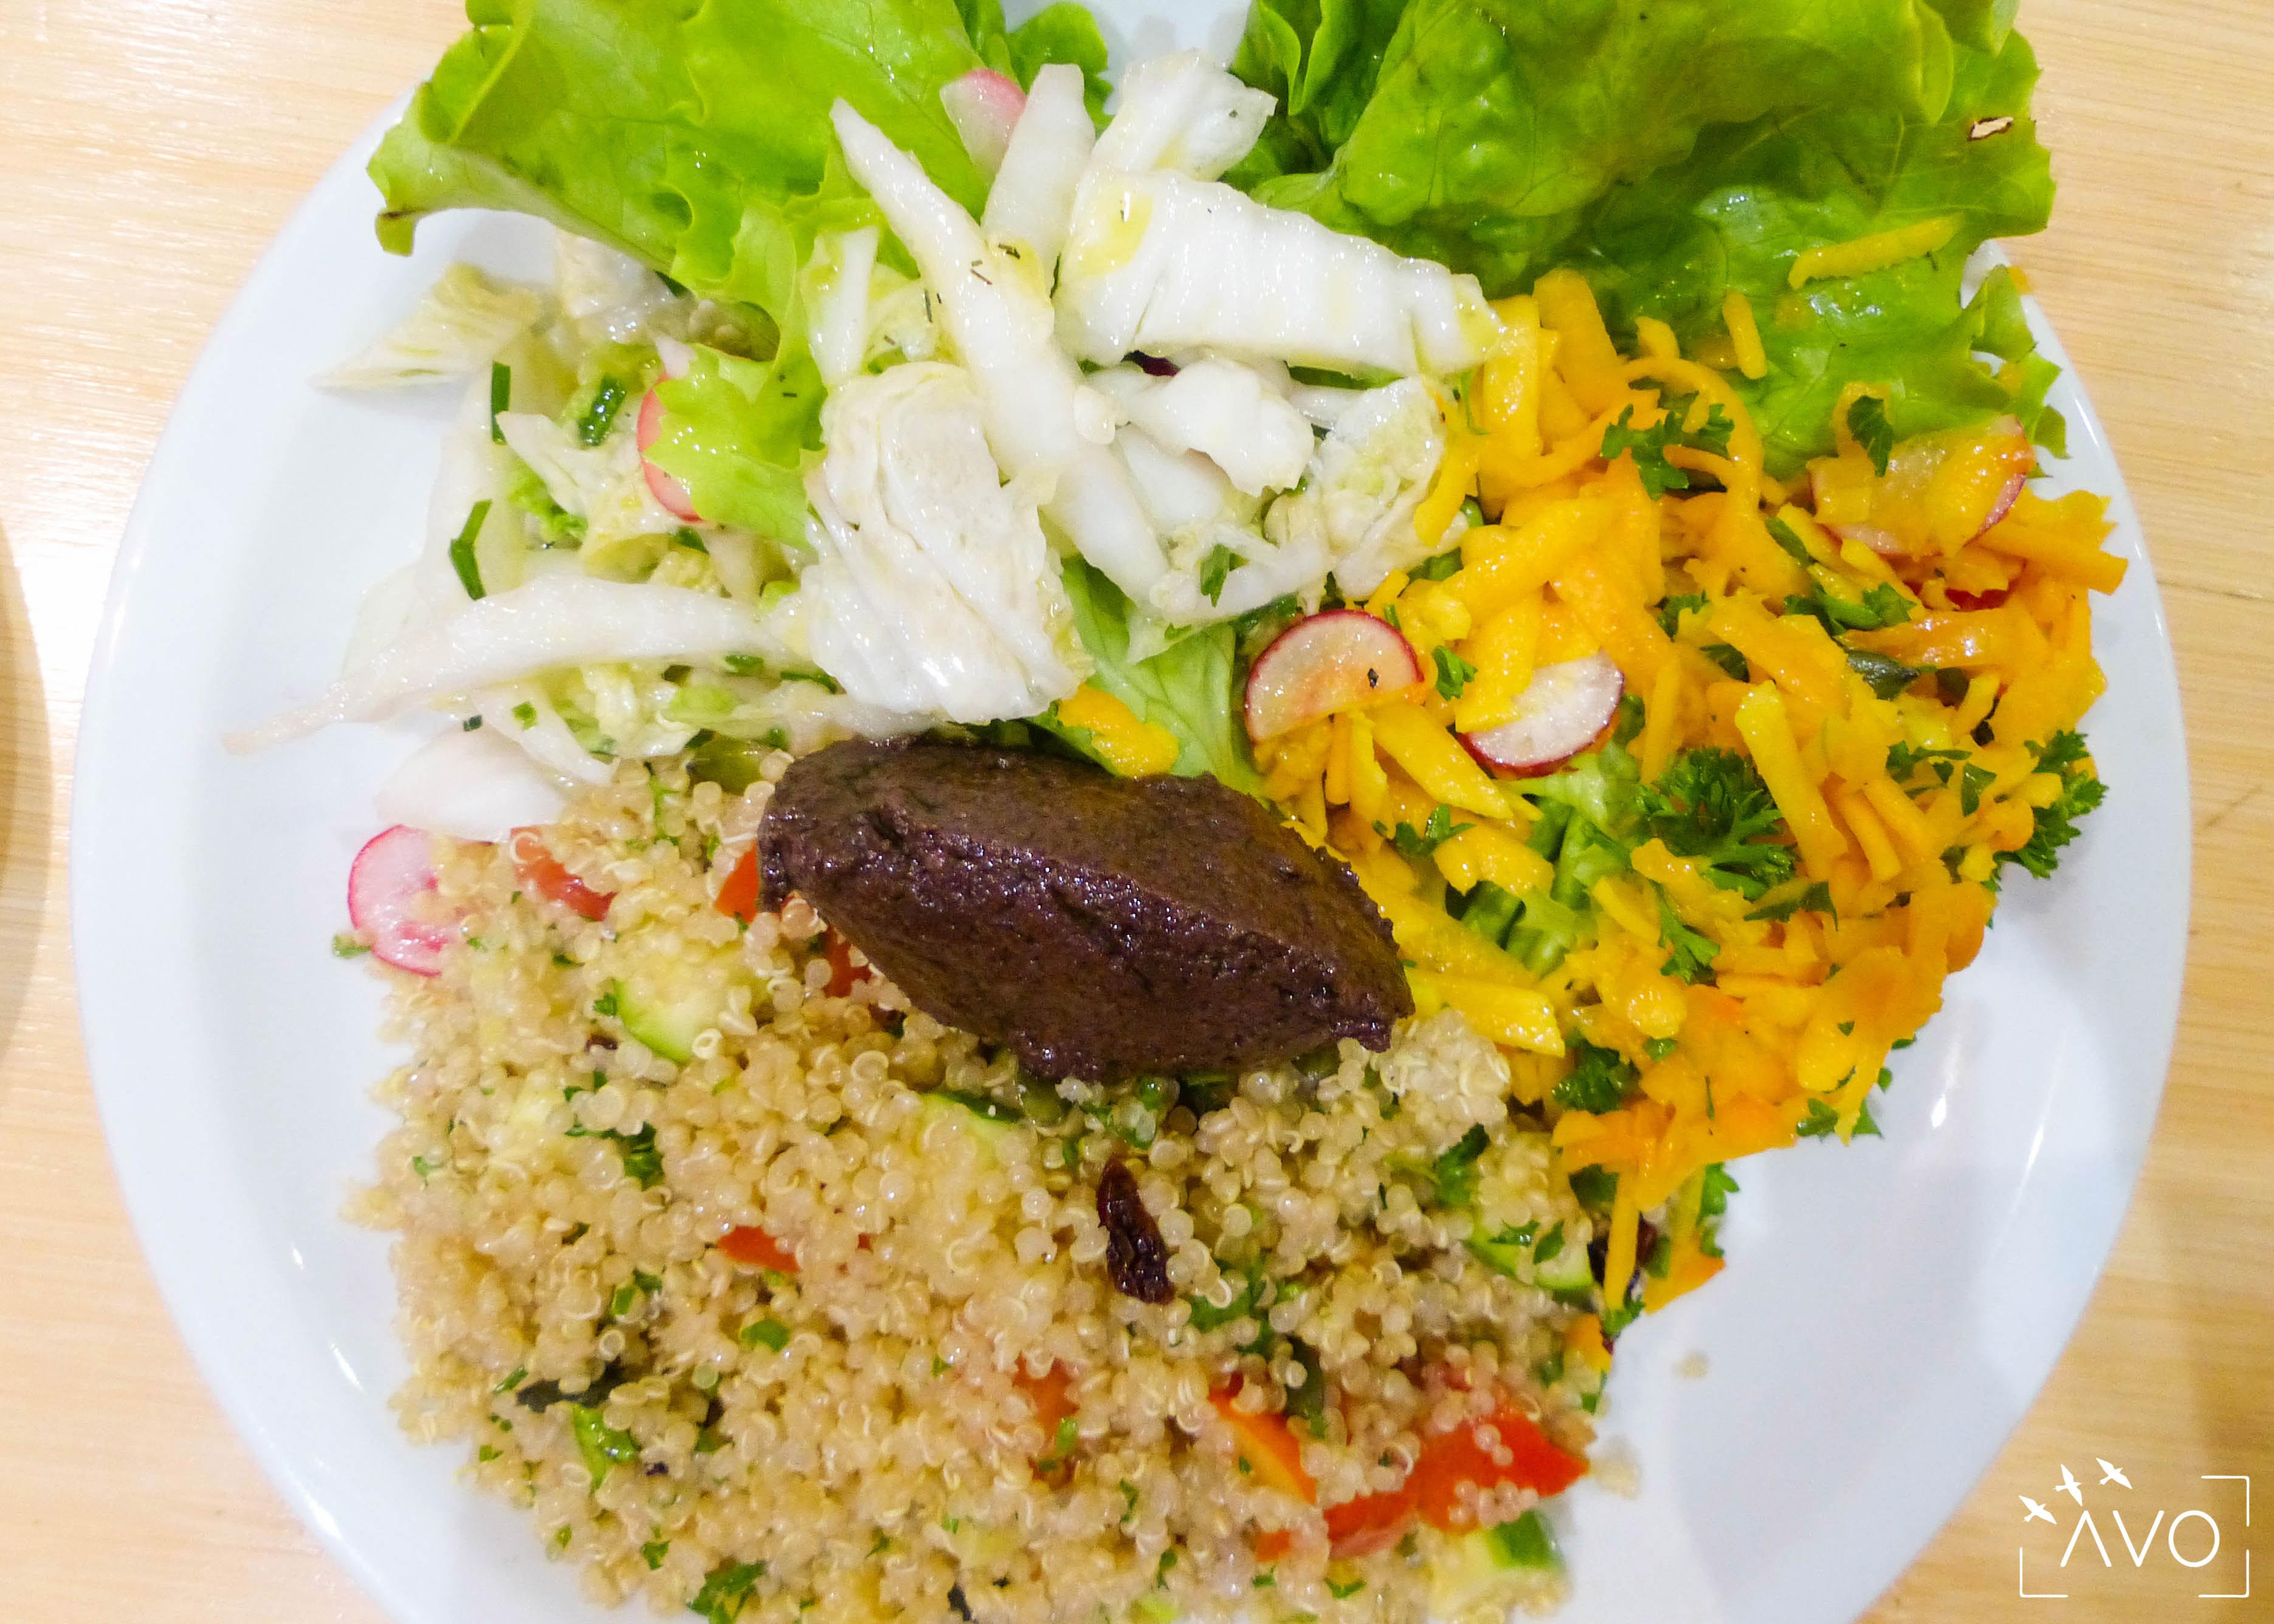 soline restaurant bio lyon nature alimentation saine lyon